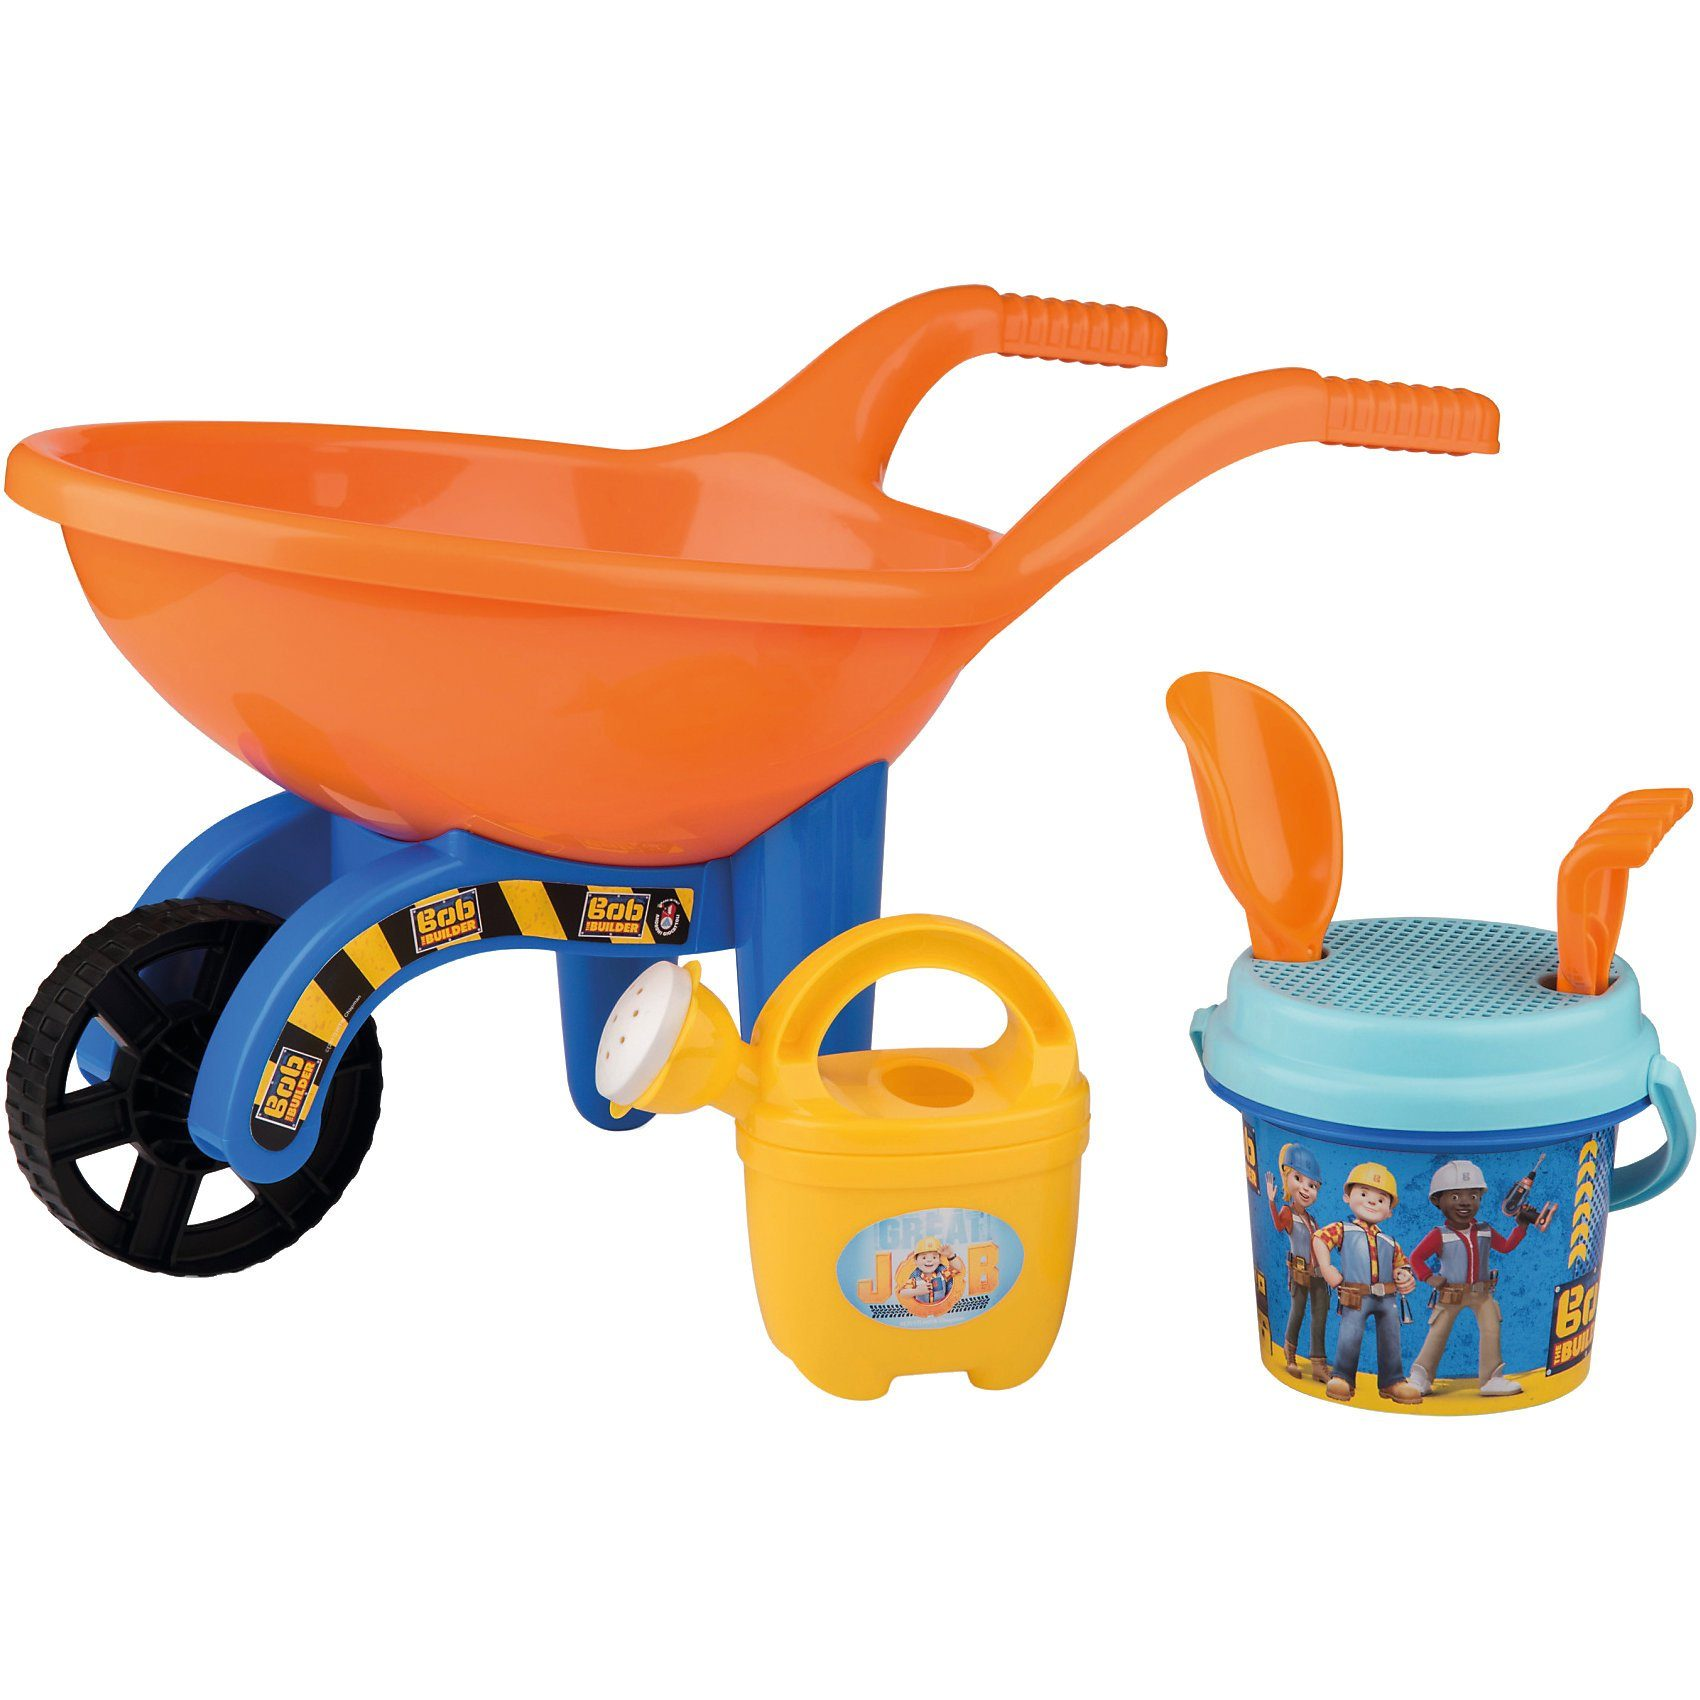 SIMBA Schubkarrenset mit Sandspielzeug, 6-tlg.